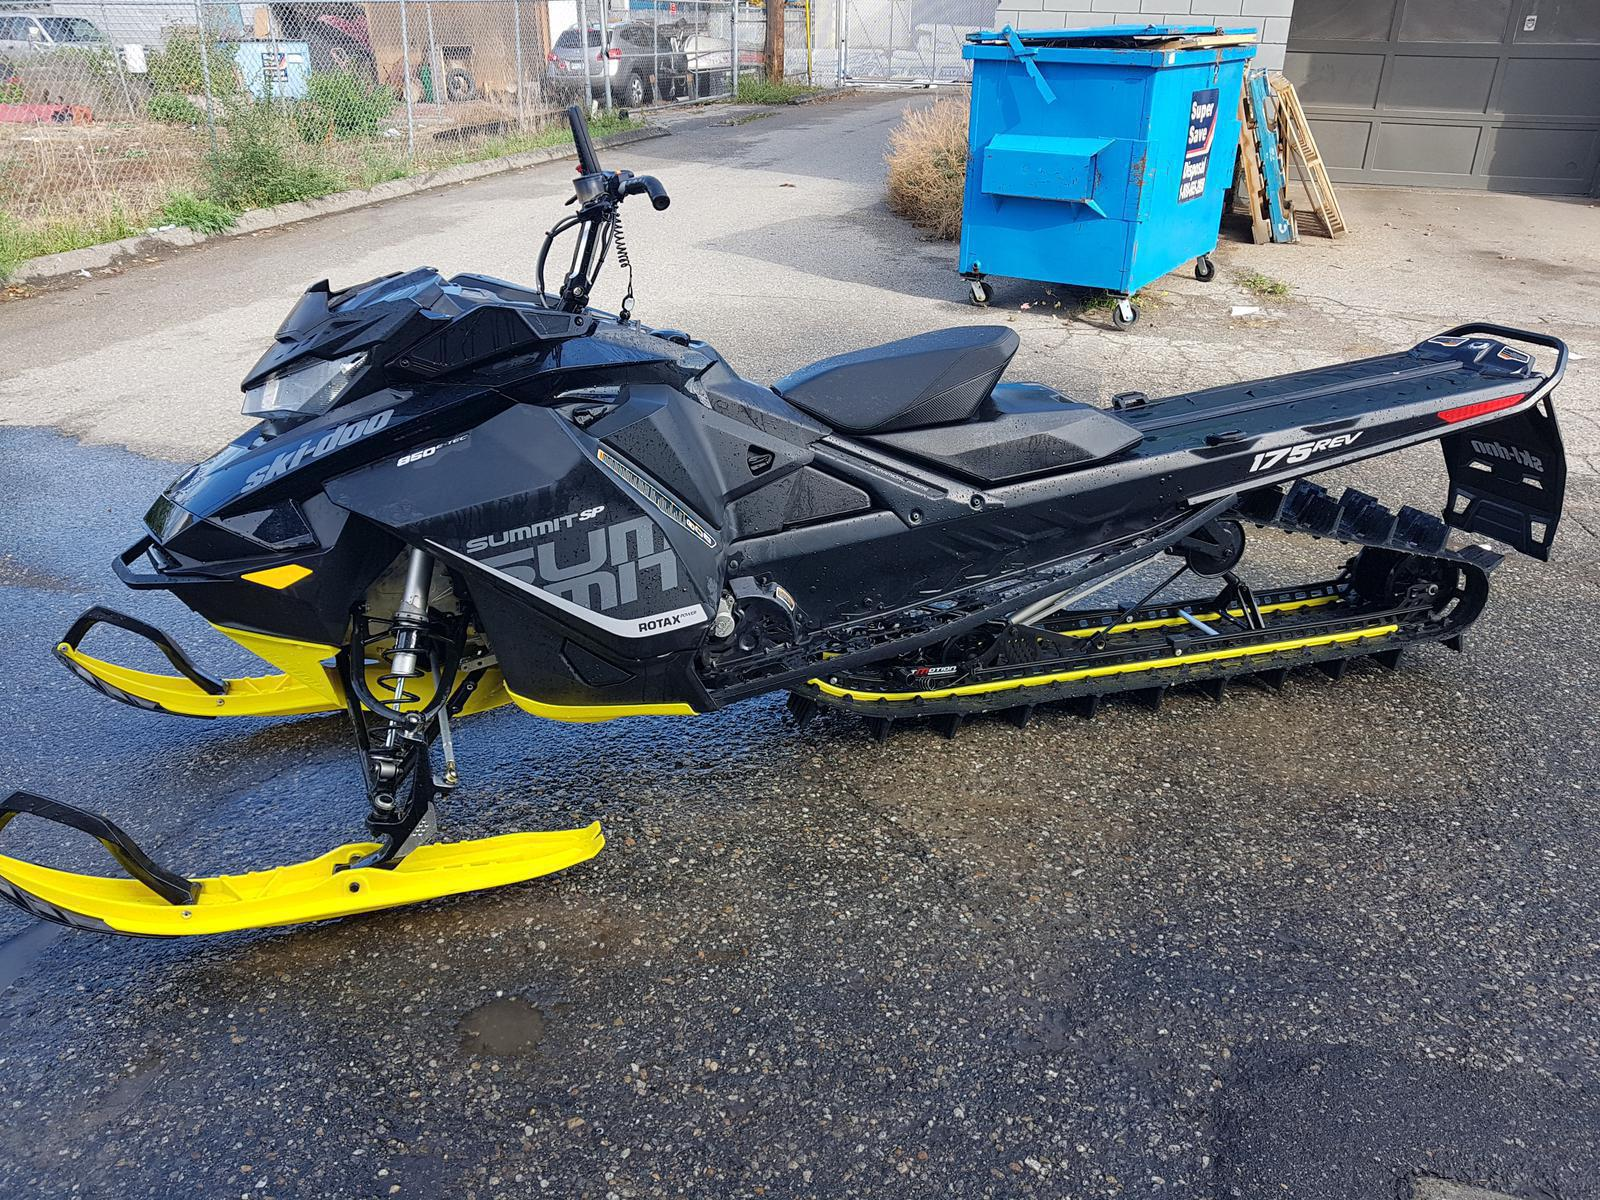 2018 Ski Doo Summit Sp 850 175 3